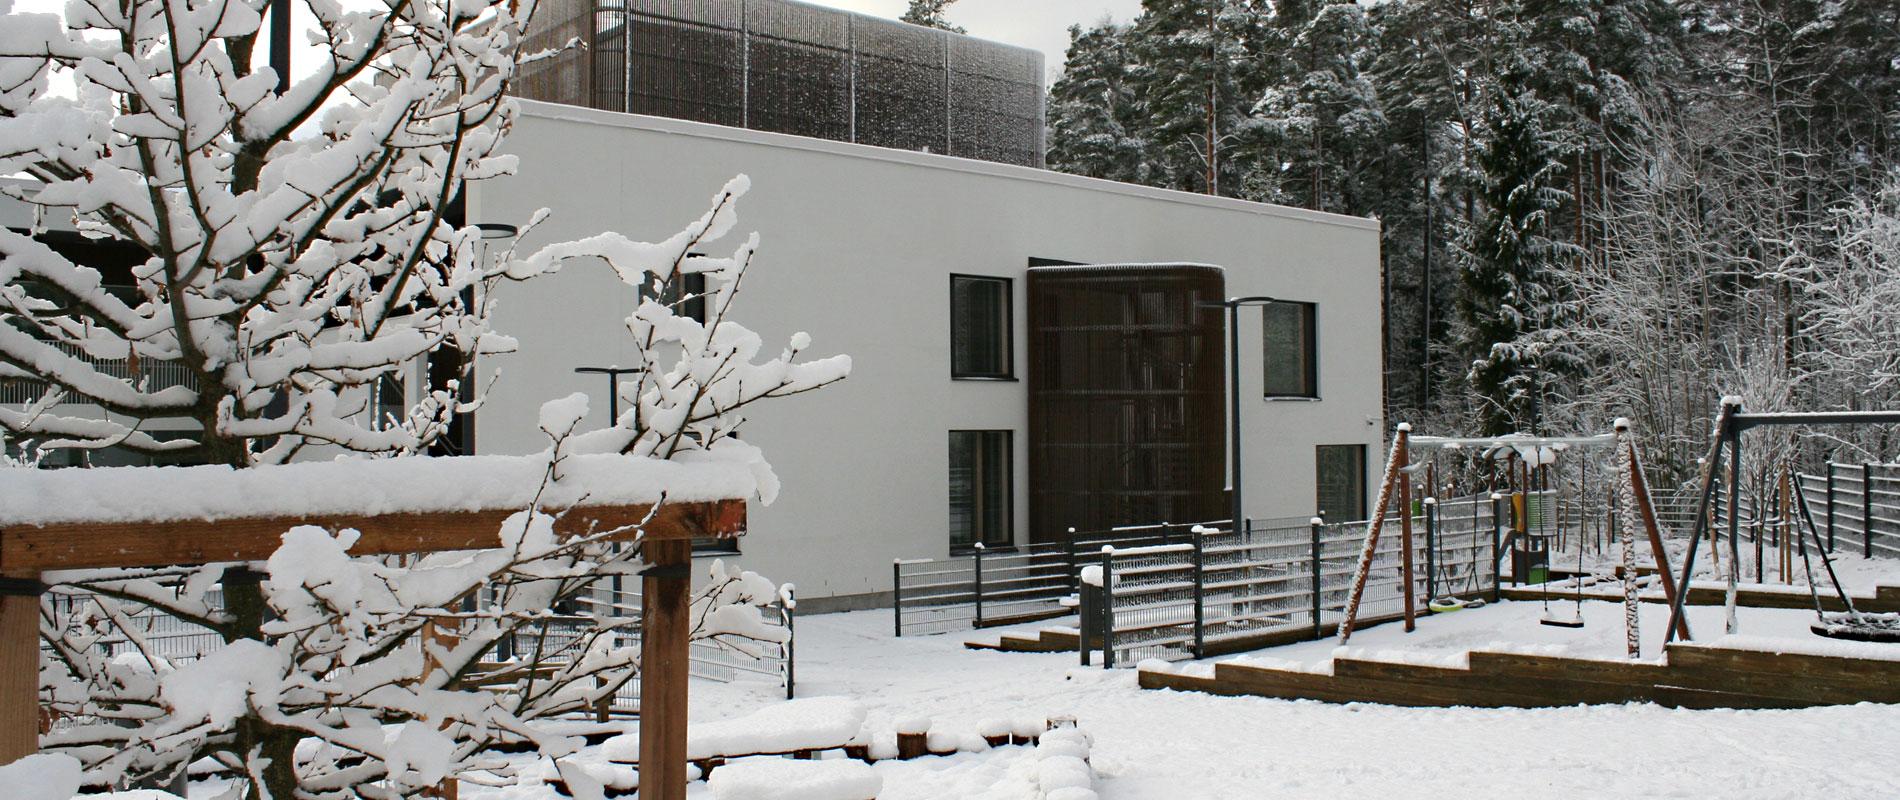 PohjTapiolanpaivakoti-winter